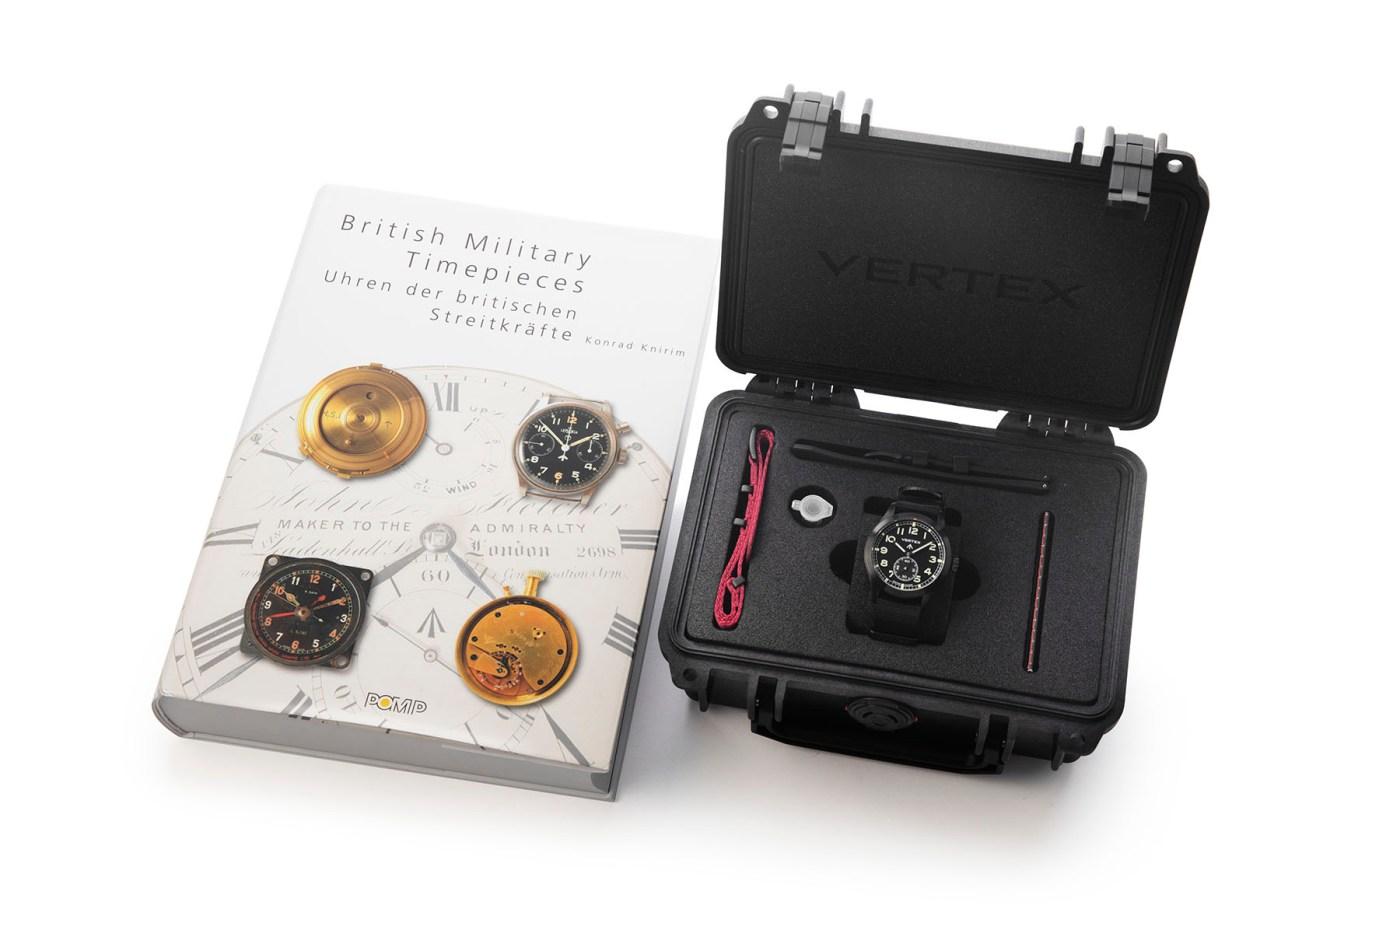 Vertex M100B case and book